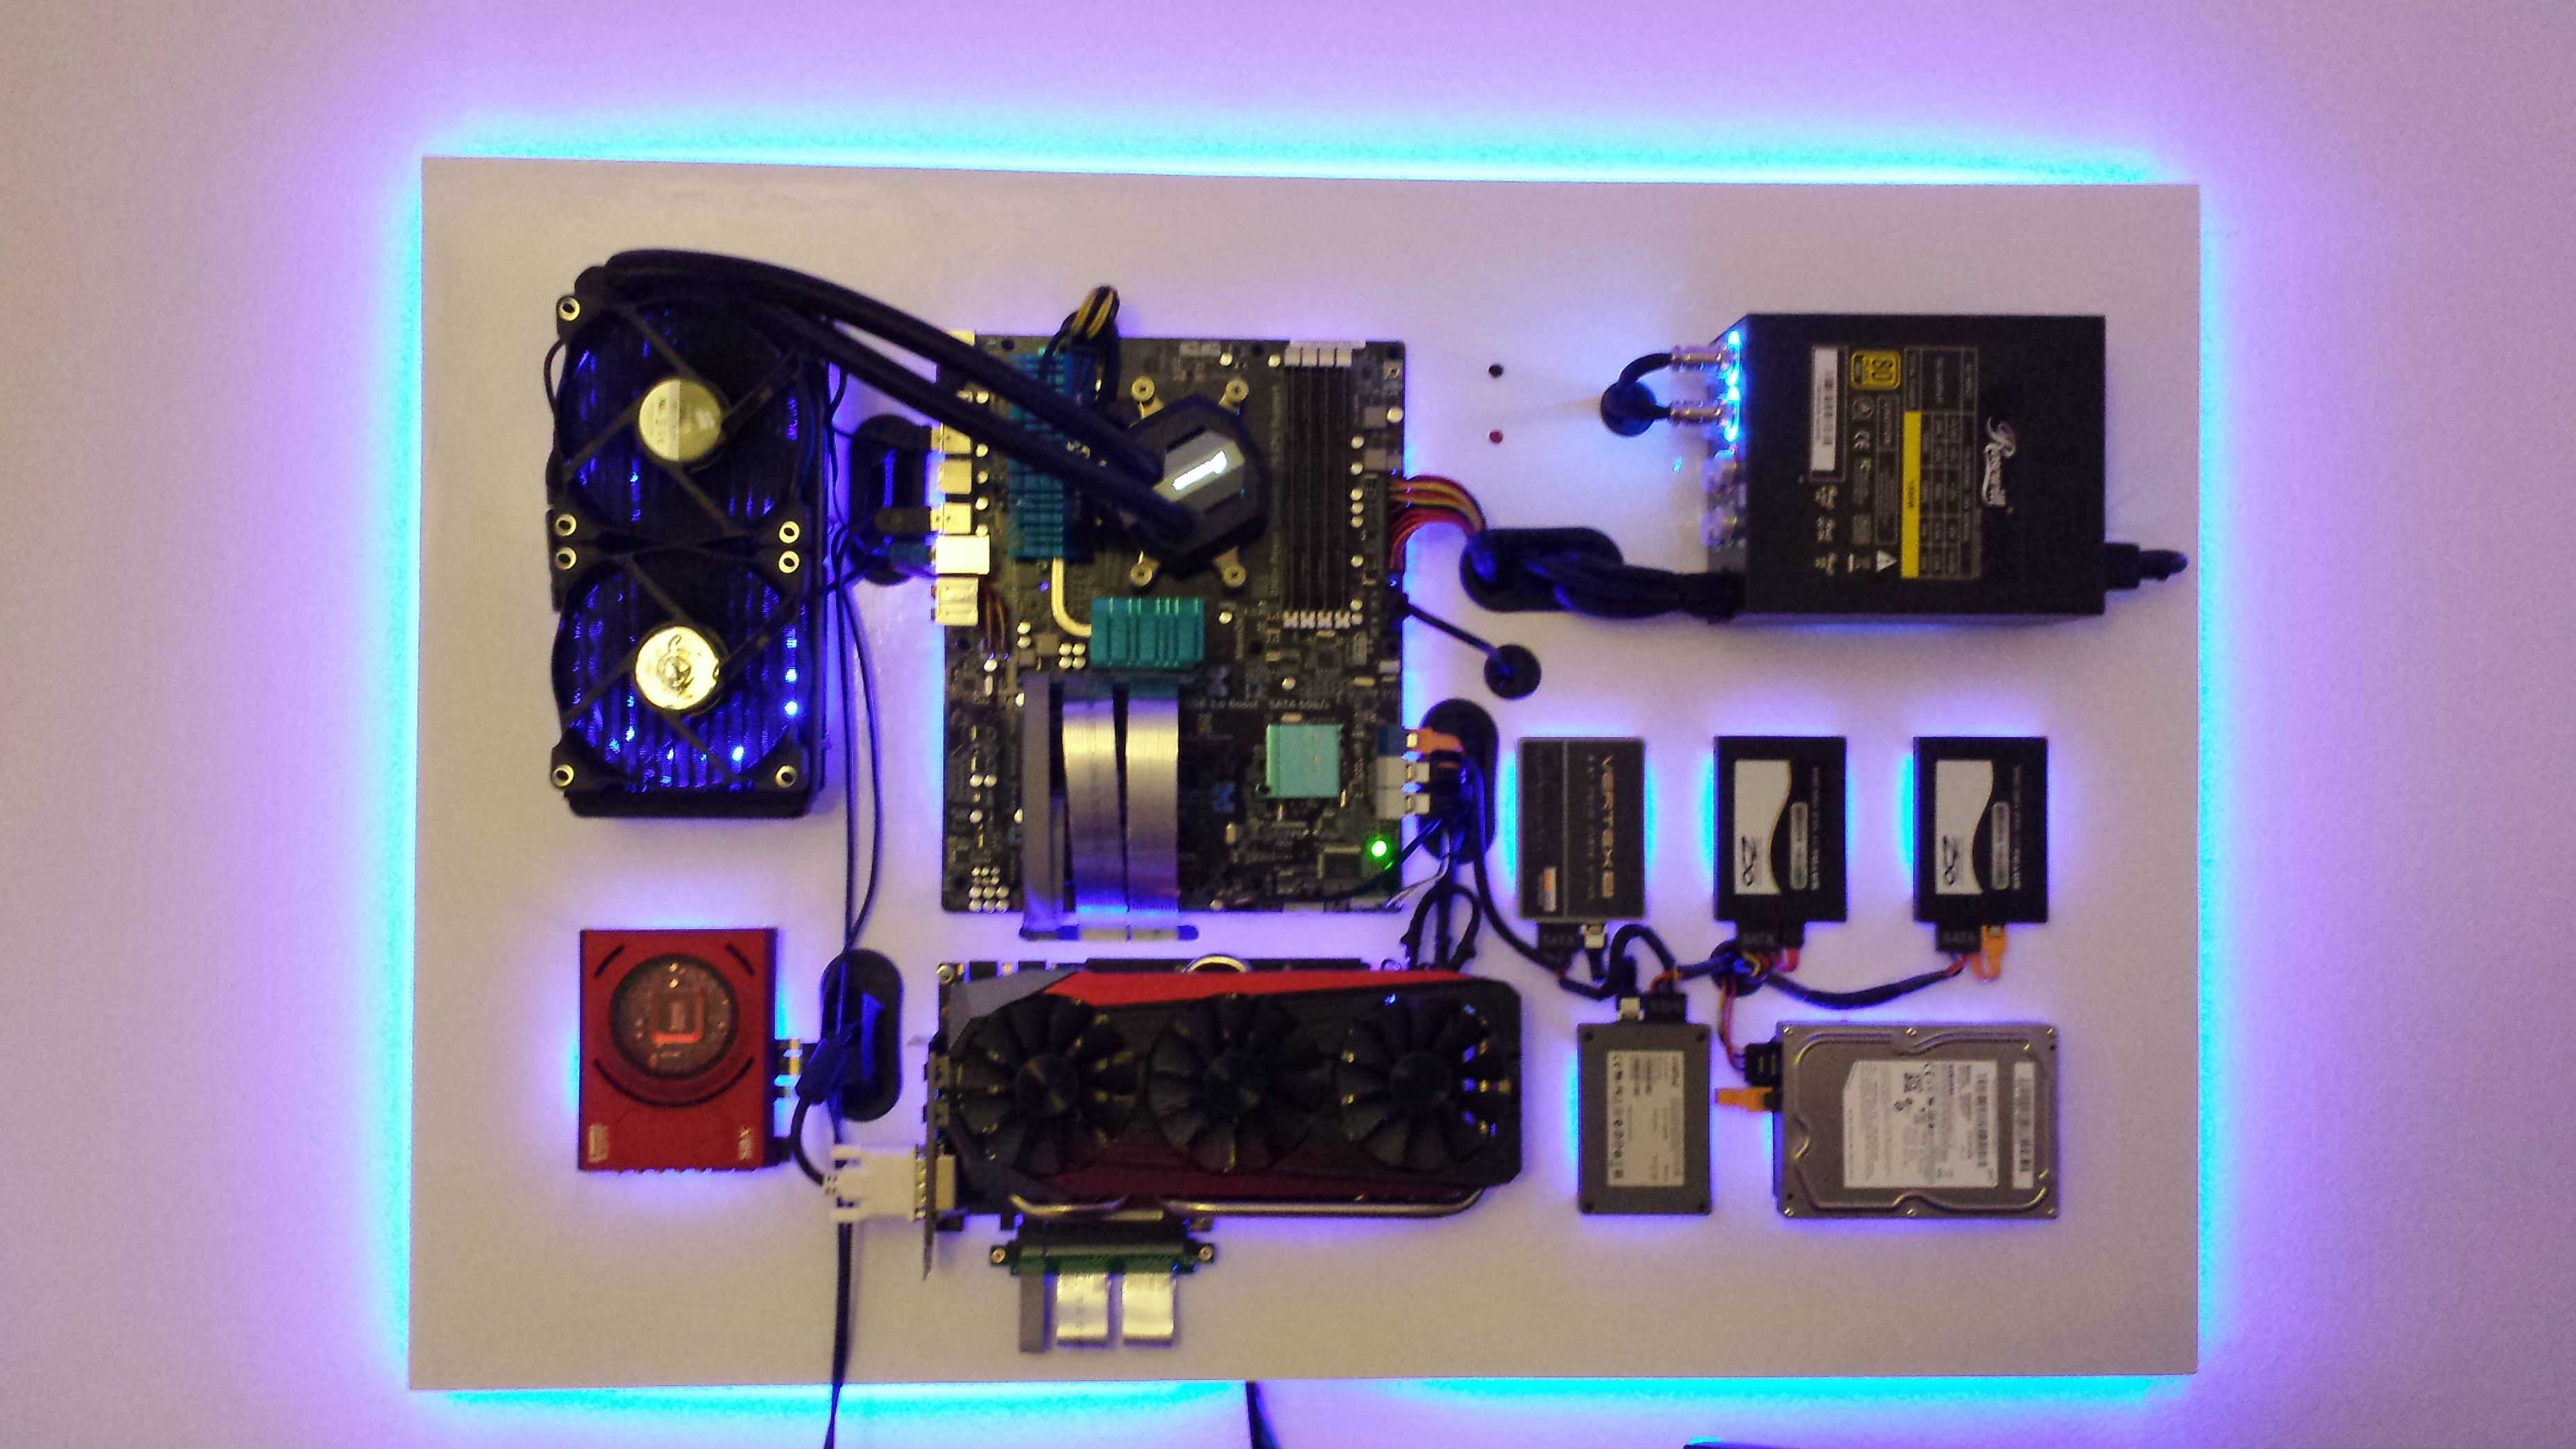 Http Imgur Com Gallery Vytjt Wall Mounted Pc Wall Computer Custom Computer